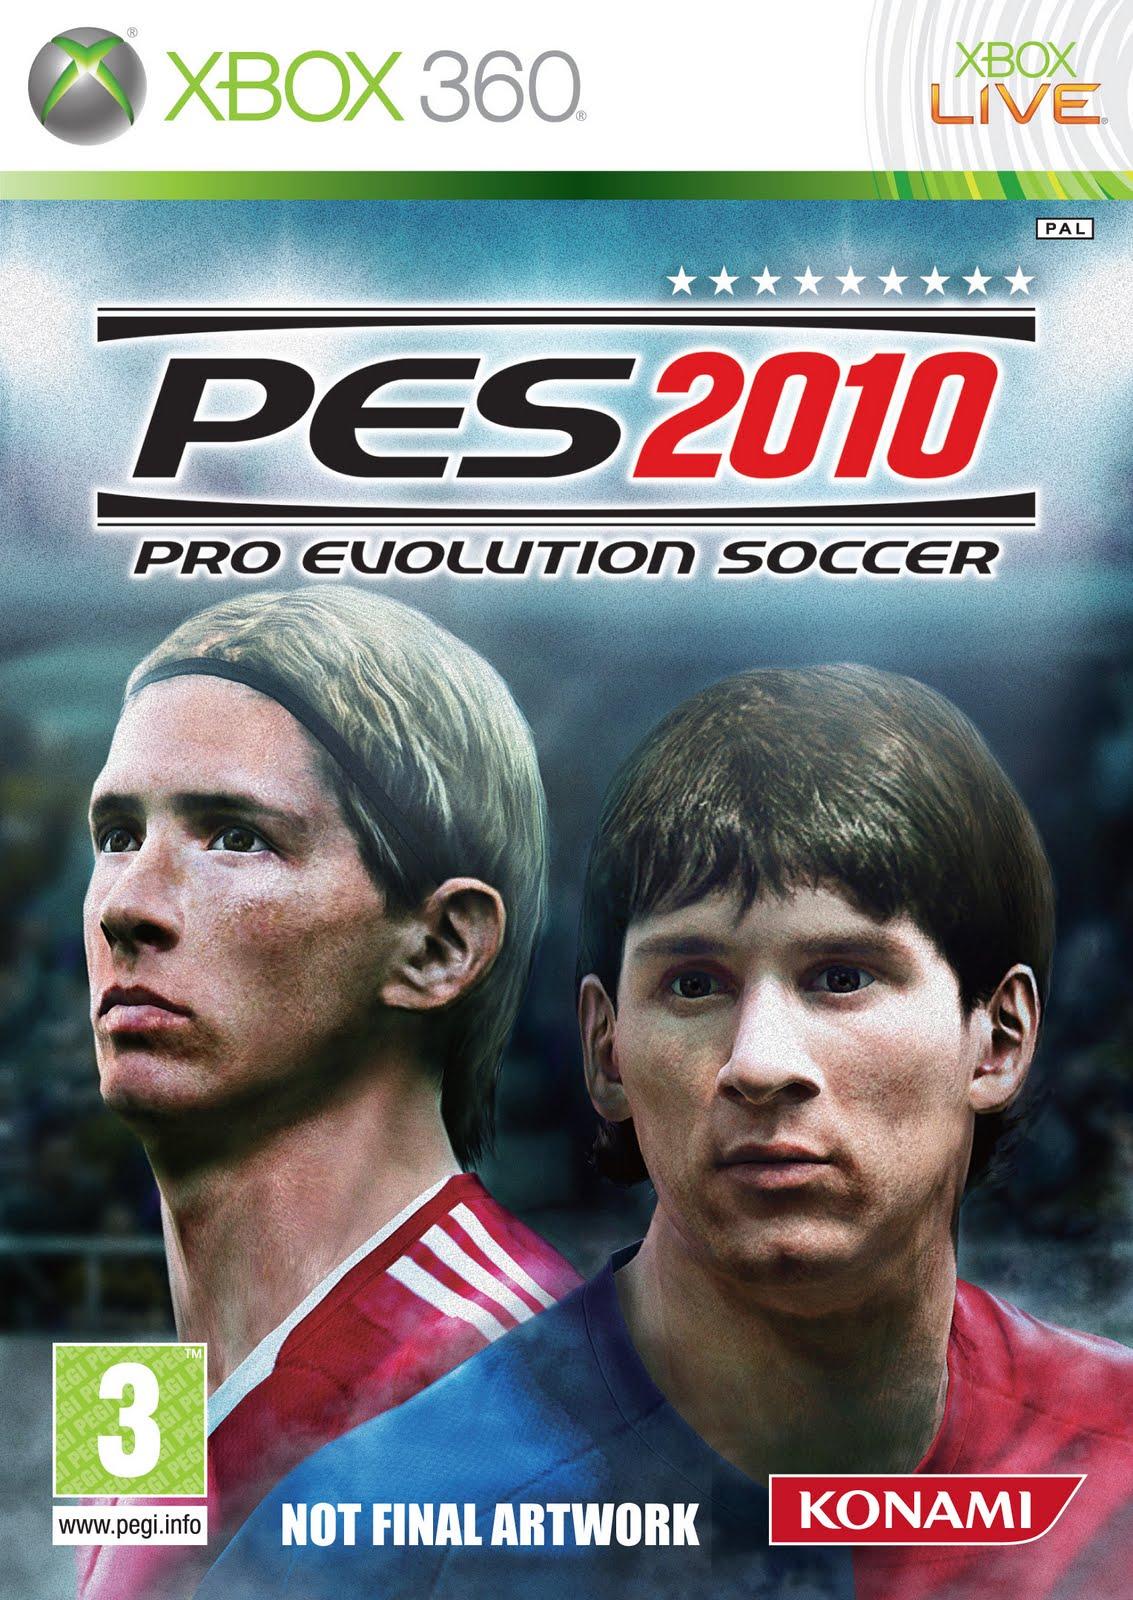 Download Pes 2010 Mit Multiplayer-kampfen